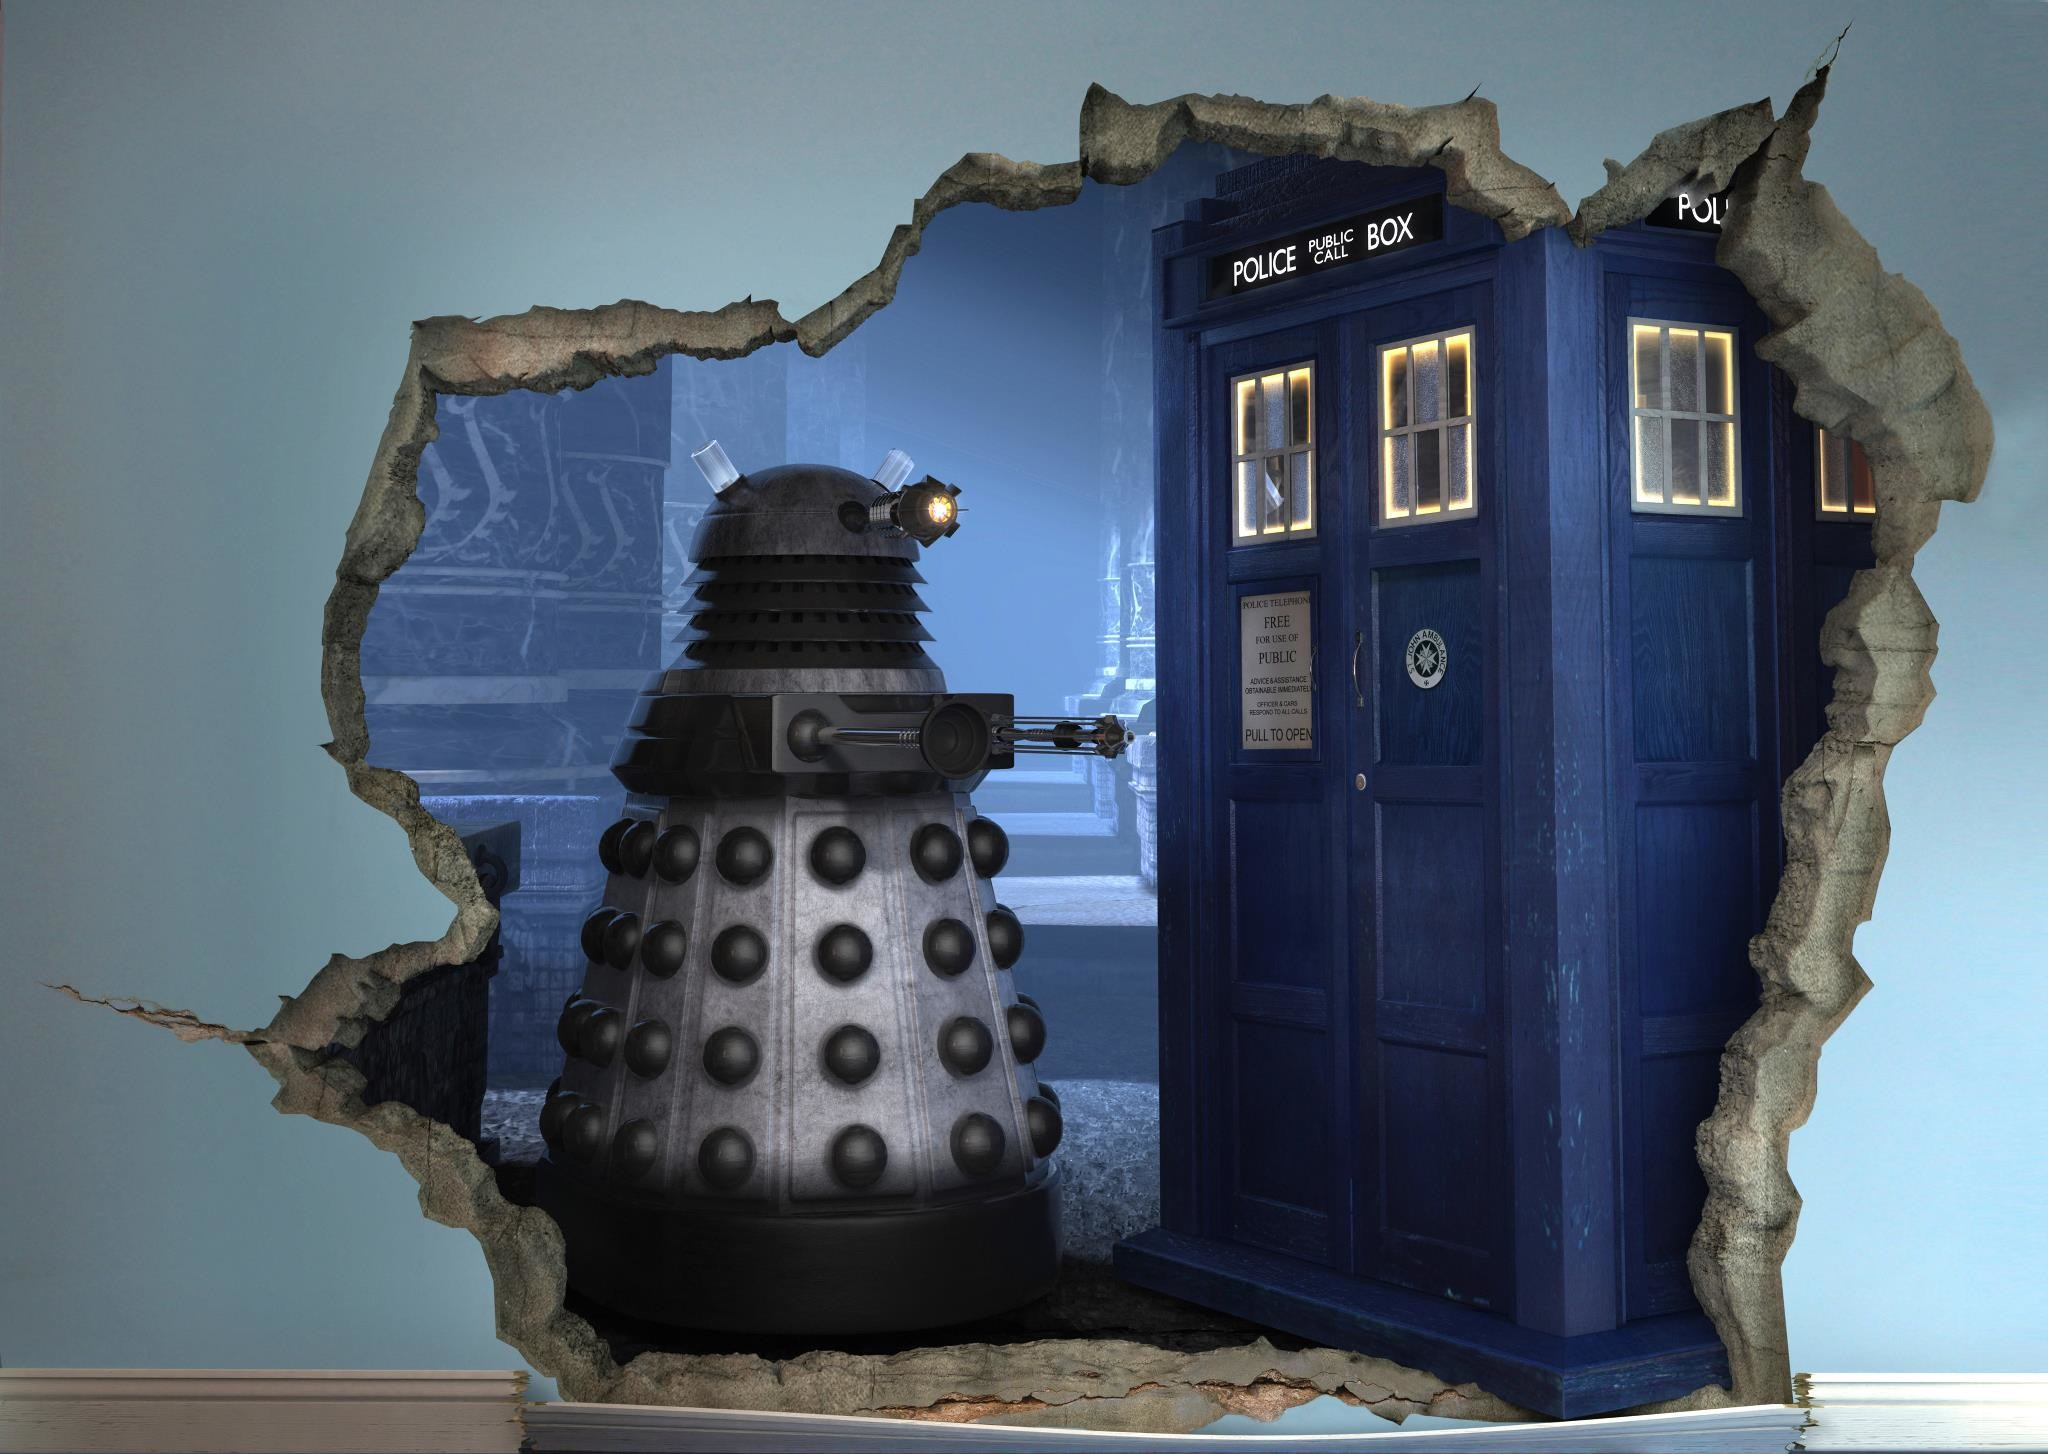 good looking doctor who bedroom wallpaper. 2048x1454 Exploding tardis mural wallpaper sticker doctor who bedroom  exploding Doctor Who Room Wallpaper 37 images